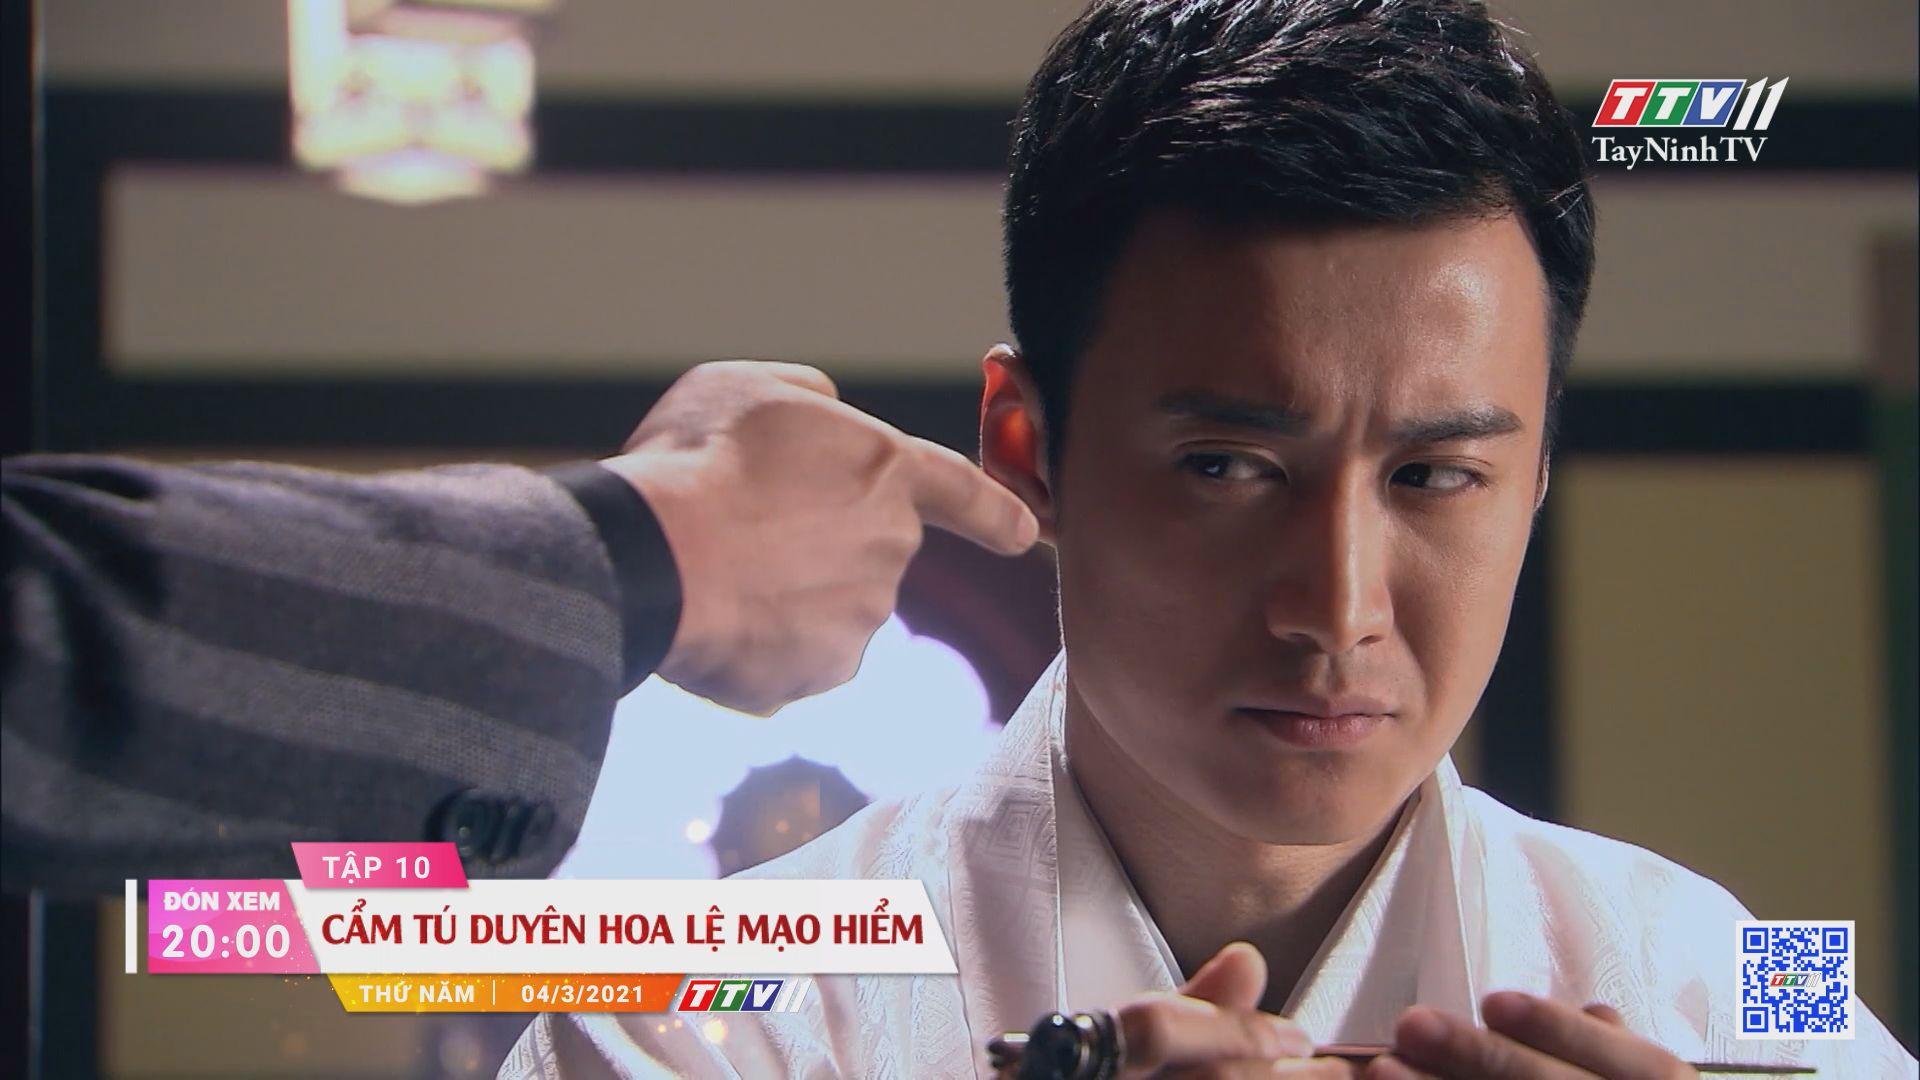 Cẩm Tú duyên hoa lệ mạo hiểm-Trailer tập 10 | PHIM CẨM TÚ DUYÊN HOA LỆ MẠO HIỂM | TayNinhTVE